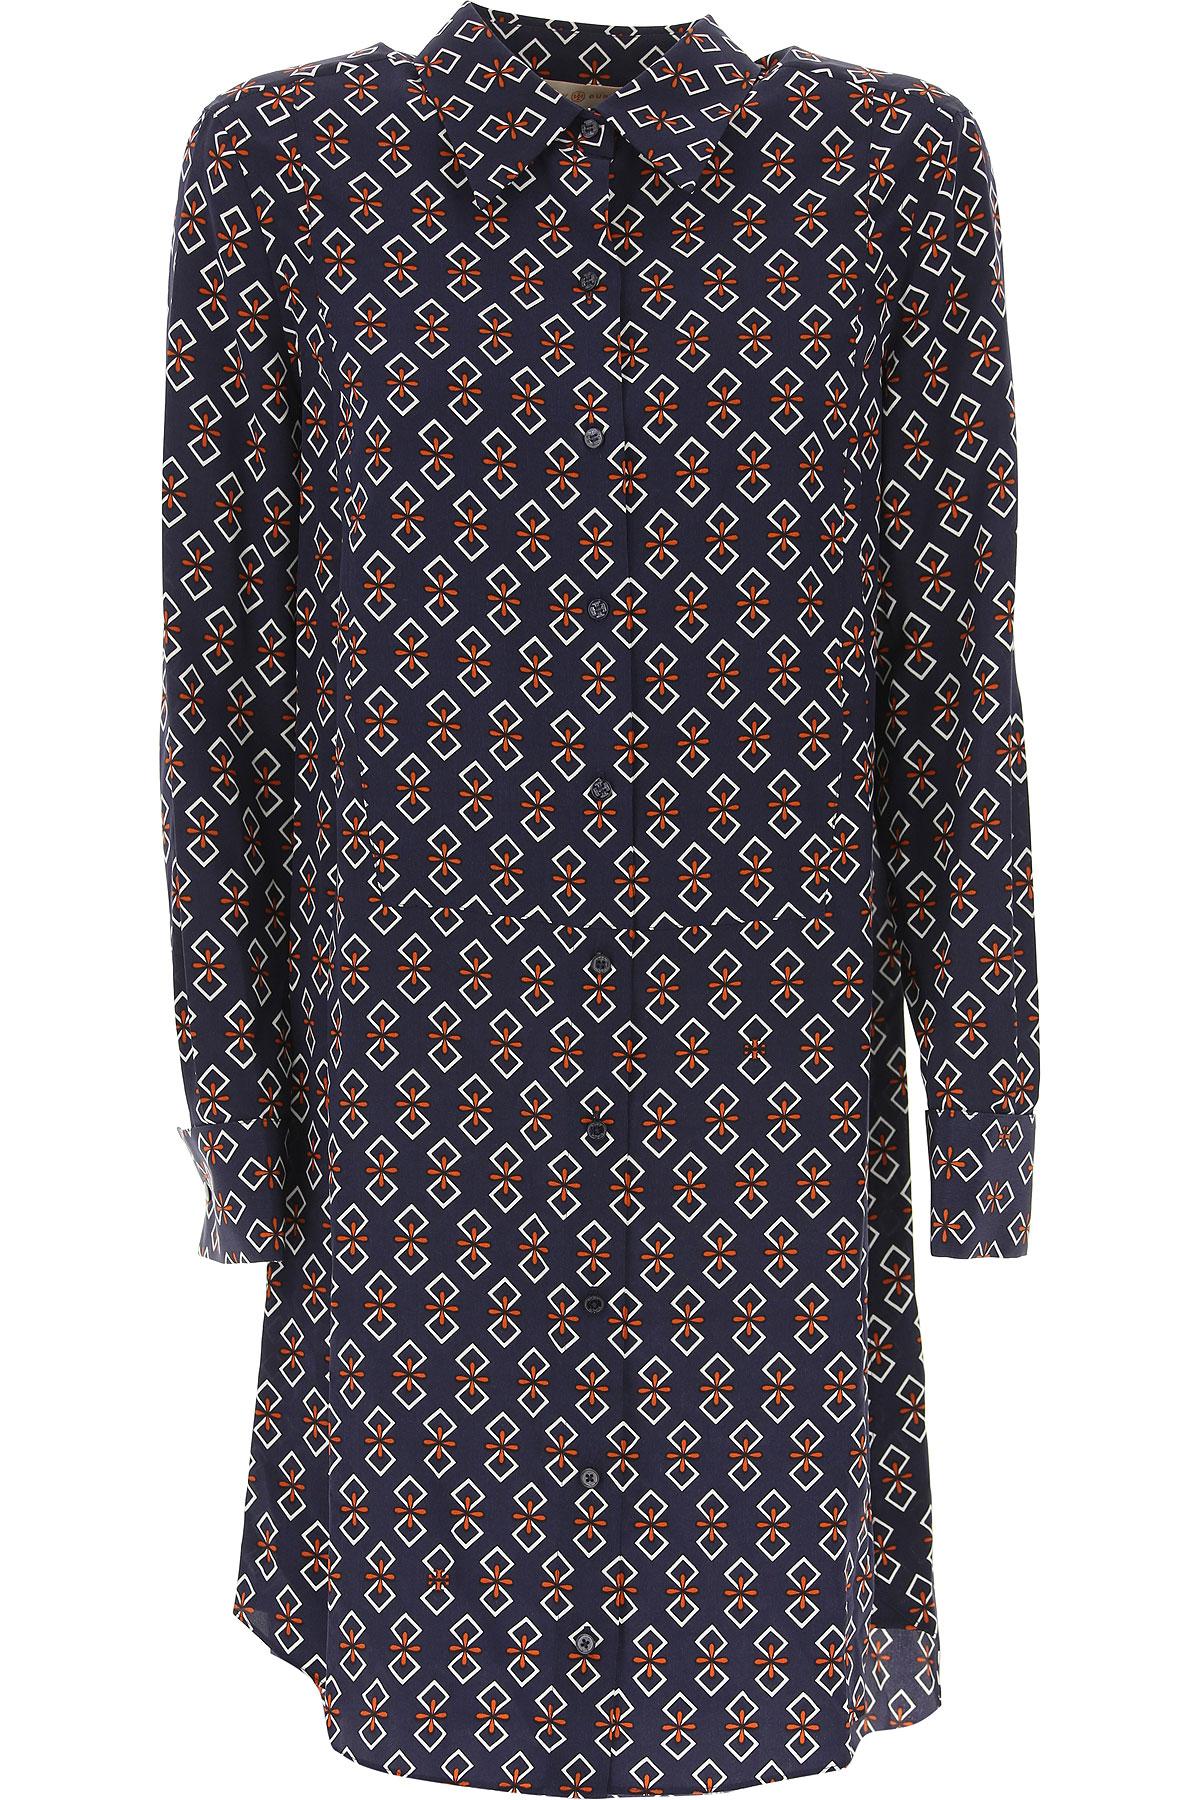 Tory Burch Dress for Women, Evening Cocktail Party, navy, Silk, 2017, IT 38 - US 0 - F 34 IT 40 - US 2 - F 36 IT 42 - US 4 - F 38 IT 44 - US 6 - F 40 USA-471360